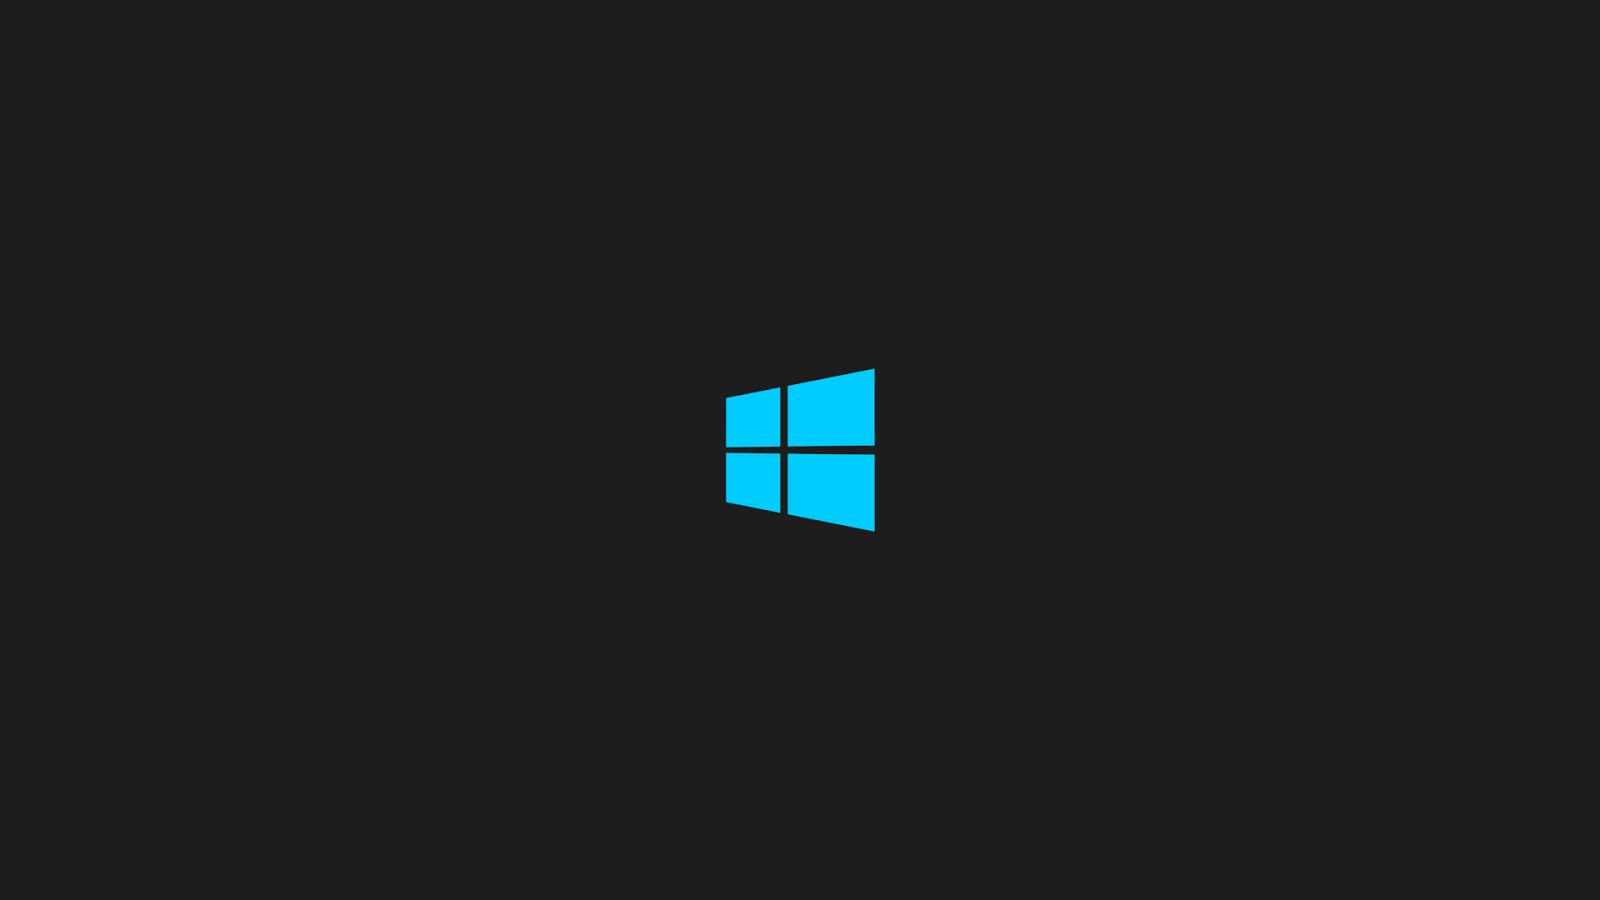 Free Download Windows 8 Wallpaper Set 10 2013 Wallpapers 1600x900